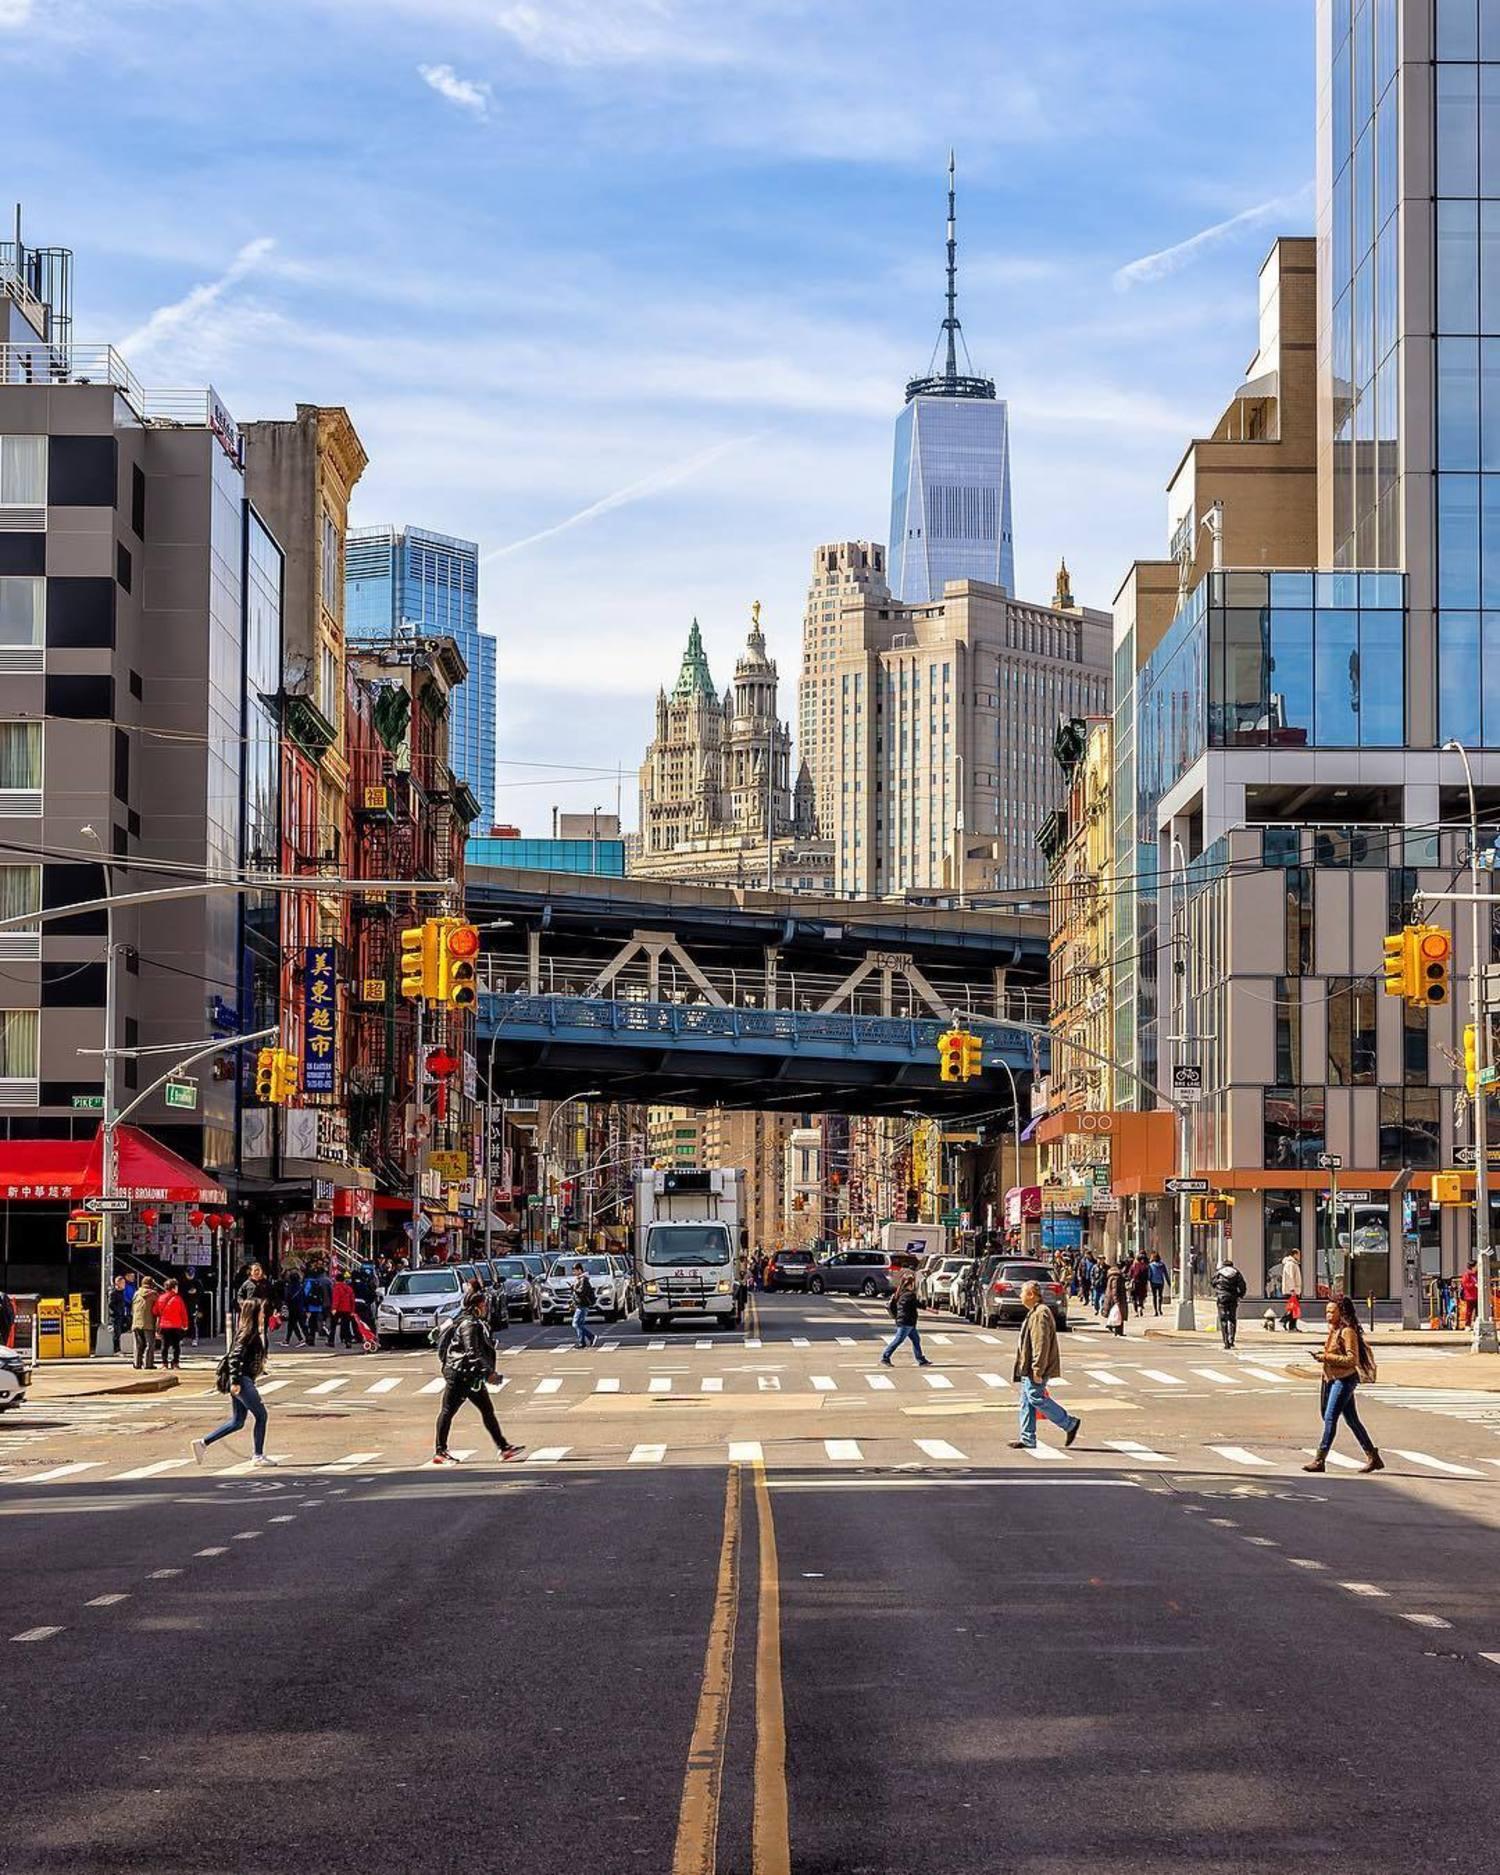 Henry Street, Chinatown, Manhattan